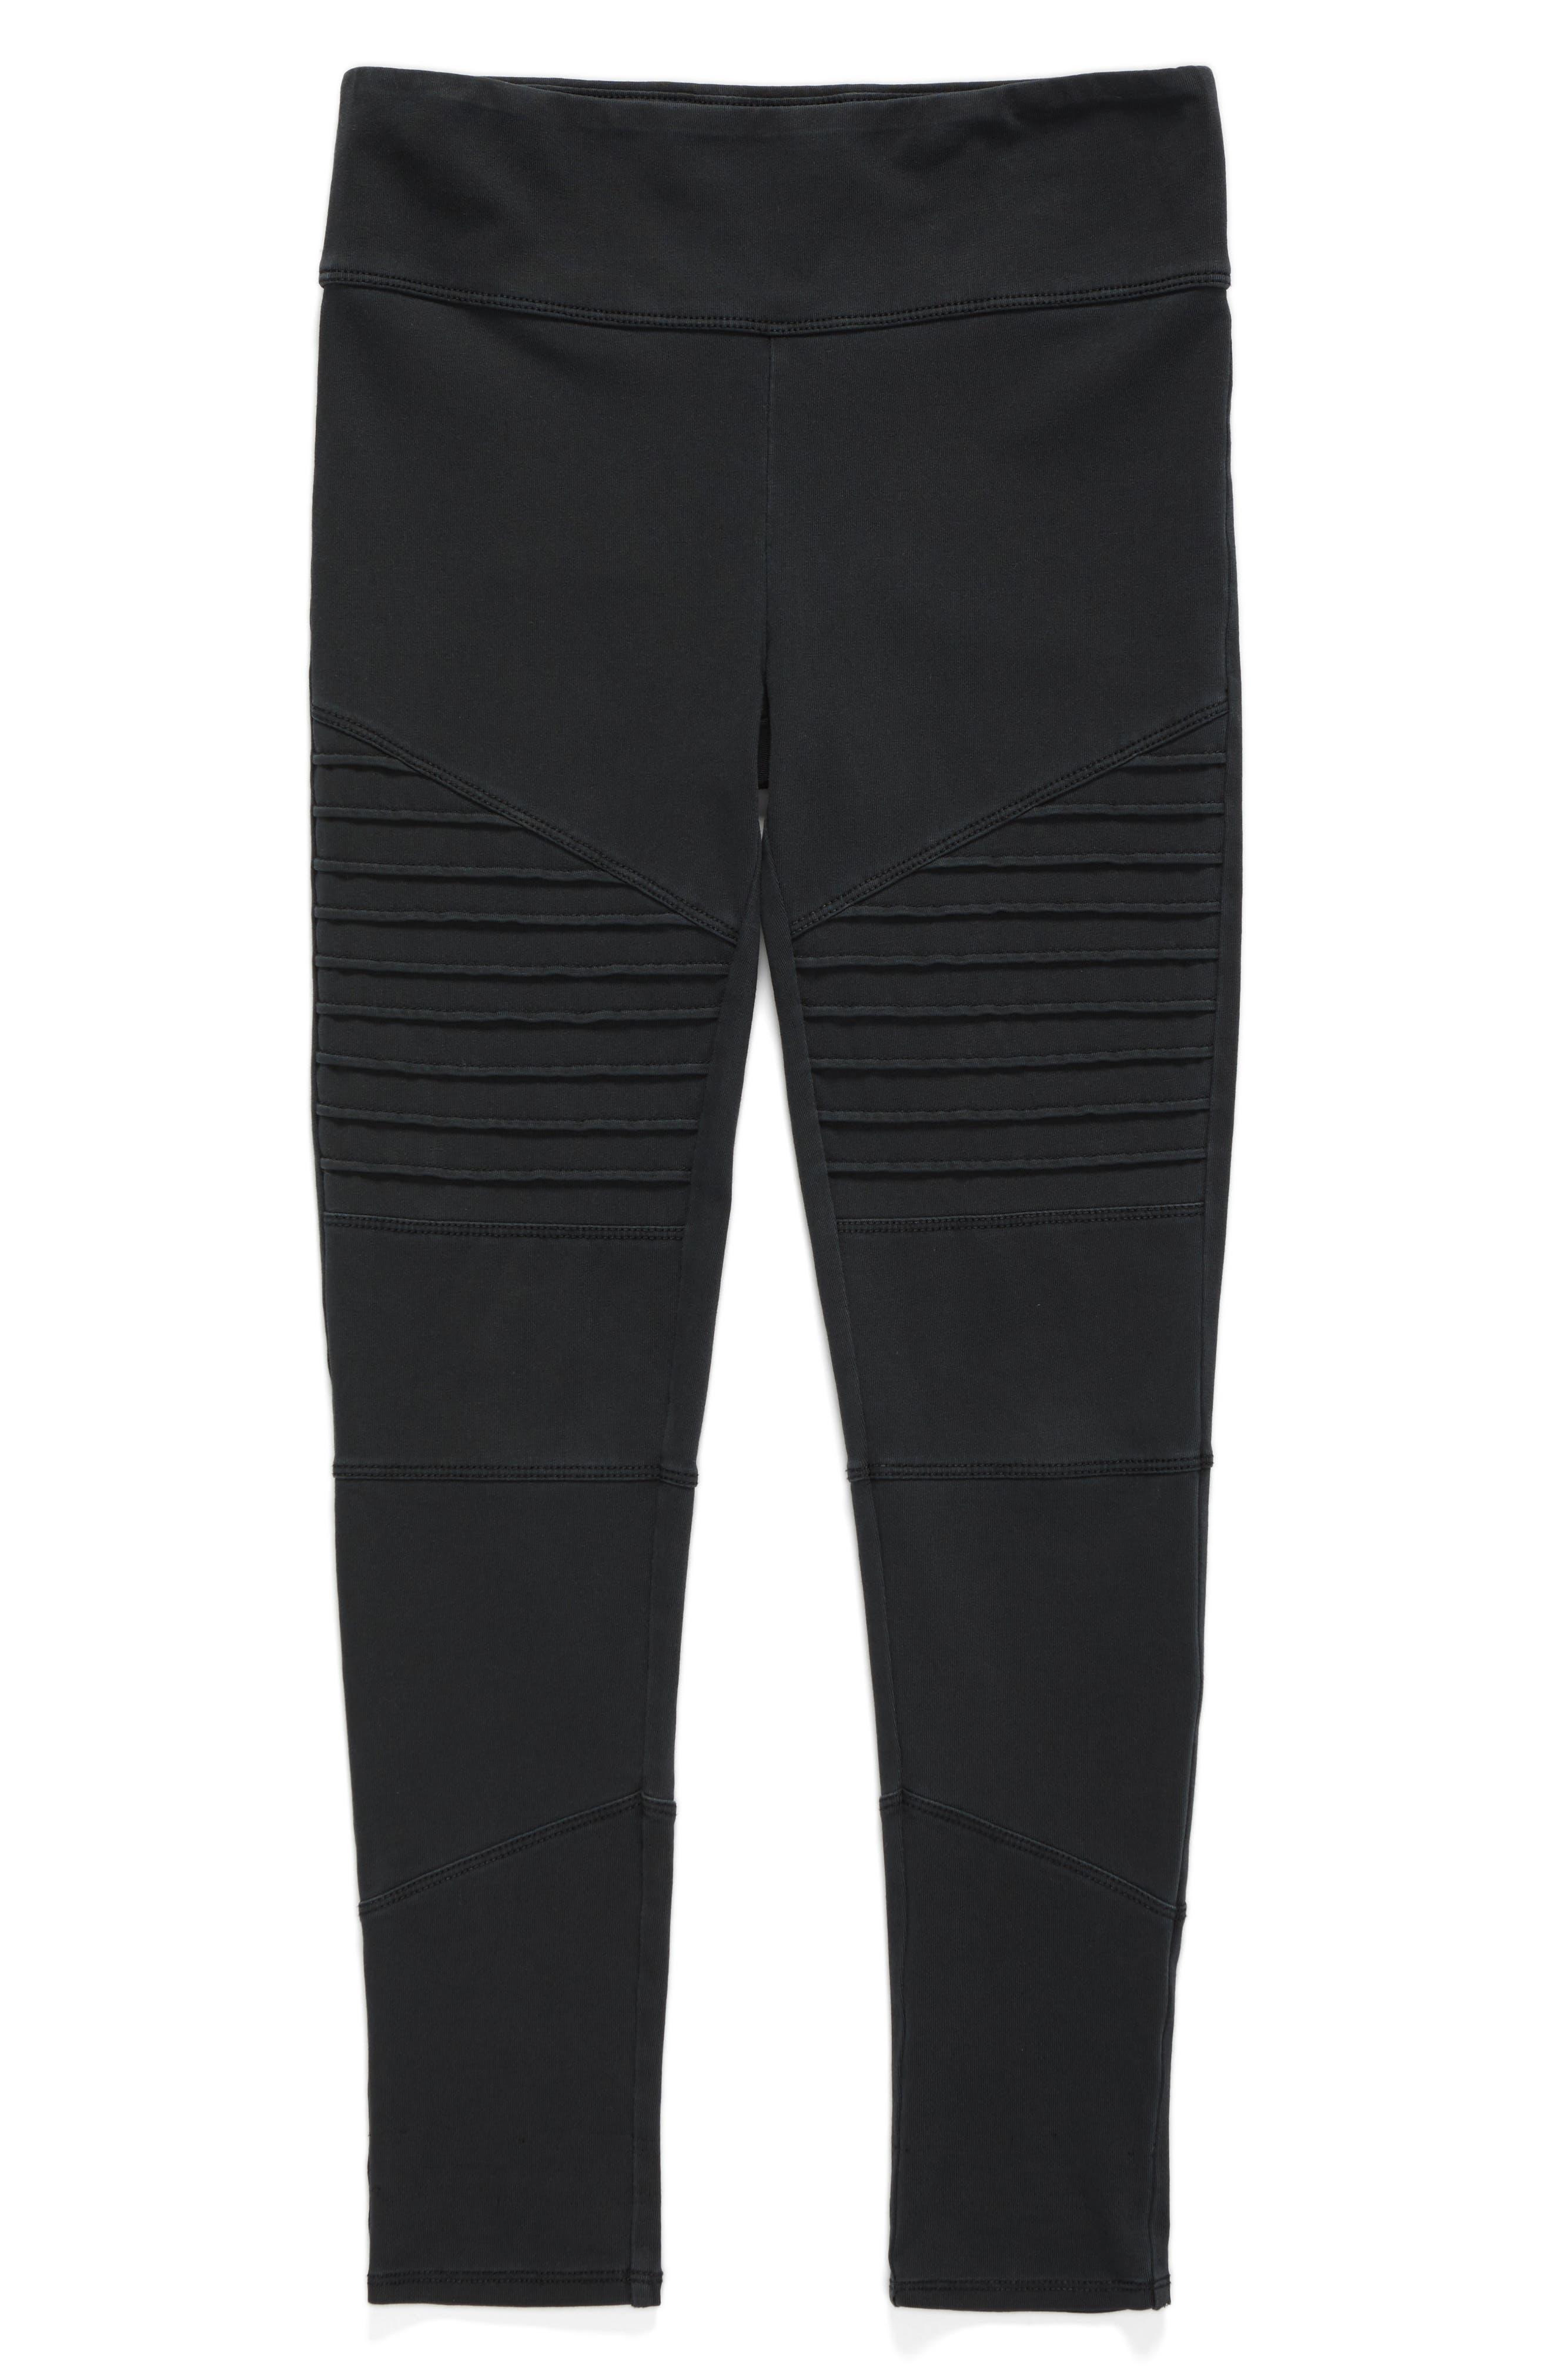 Alternate Image 1 Selected - Tucker + Tate High Waist Moto Pants (Big Girls)